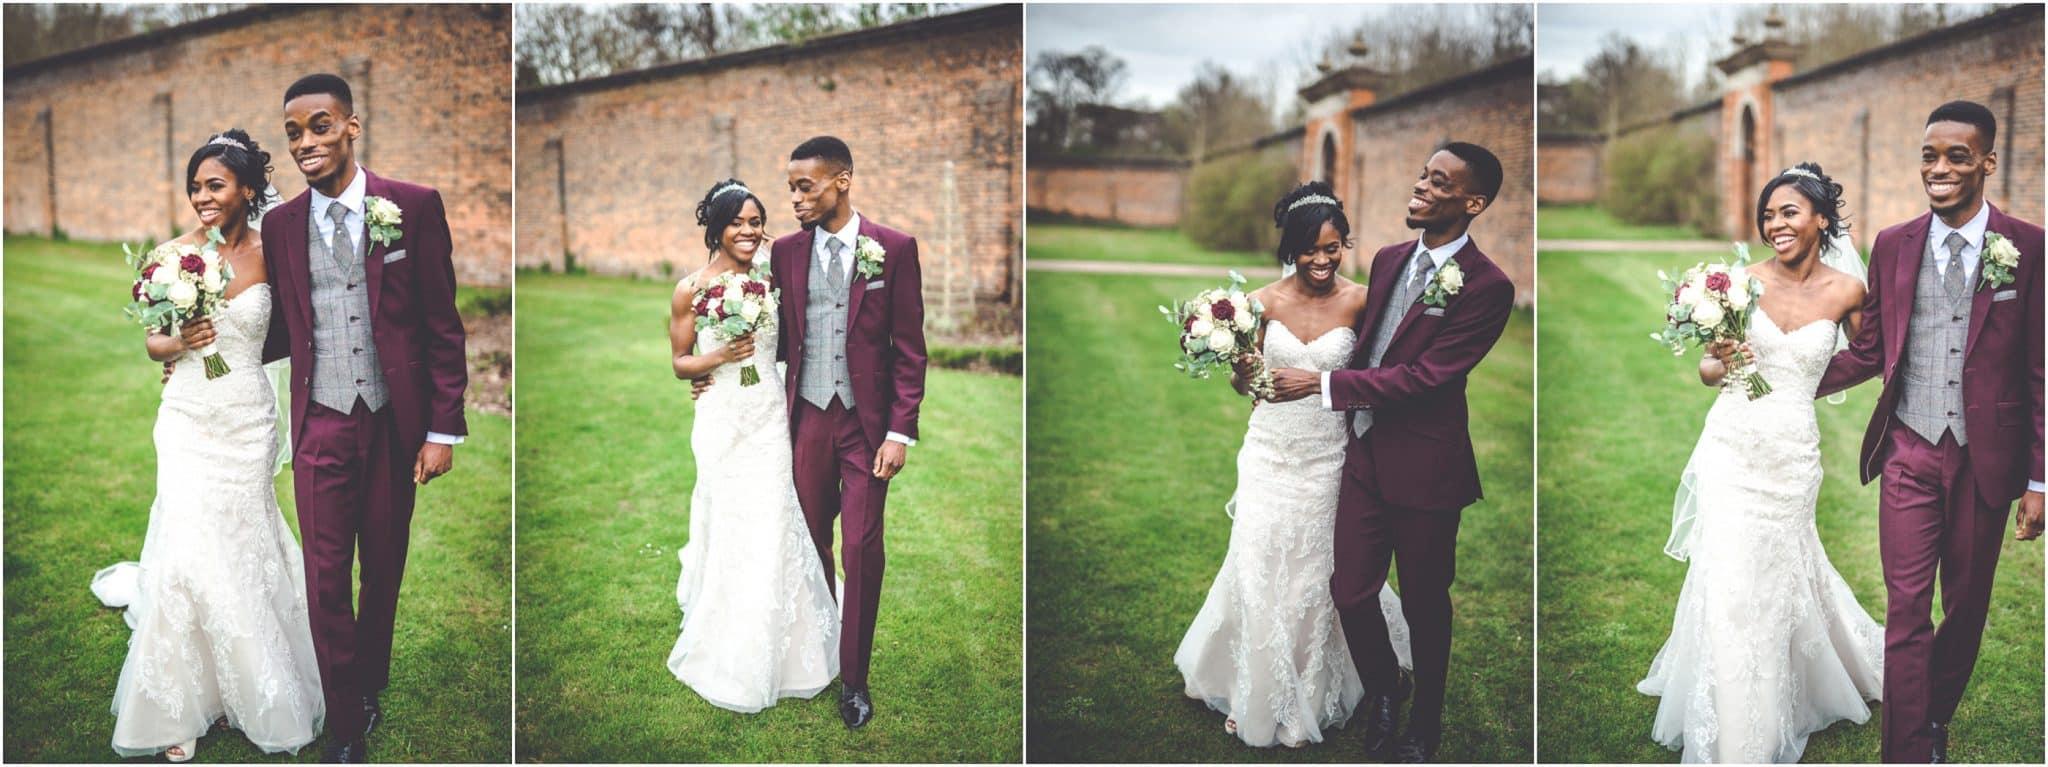 wedding photographer Luton, wedding photographer Bedfordshire, Luton Hoo Walled Garden